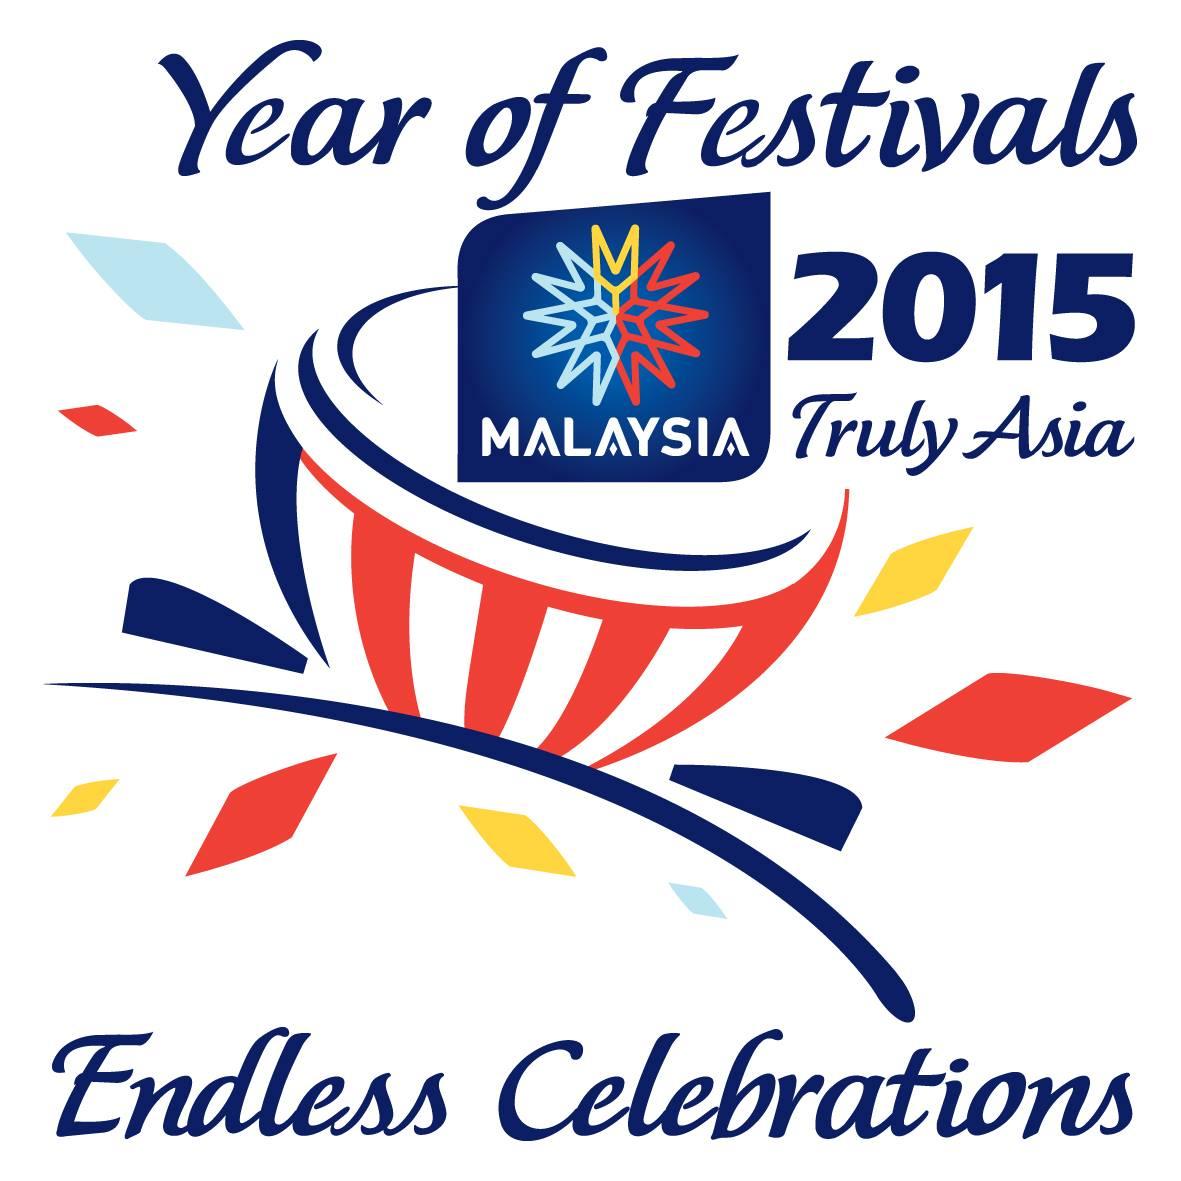 Malaysia Year of Festival 2015